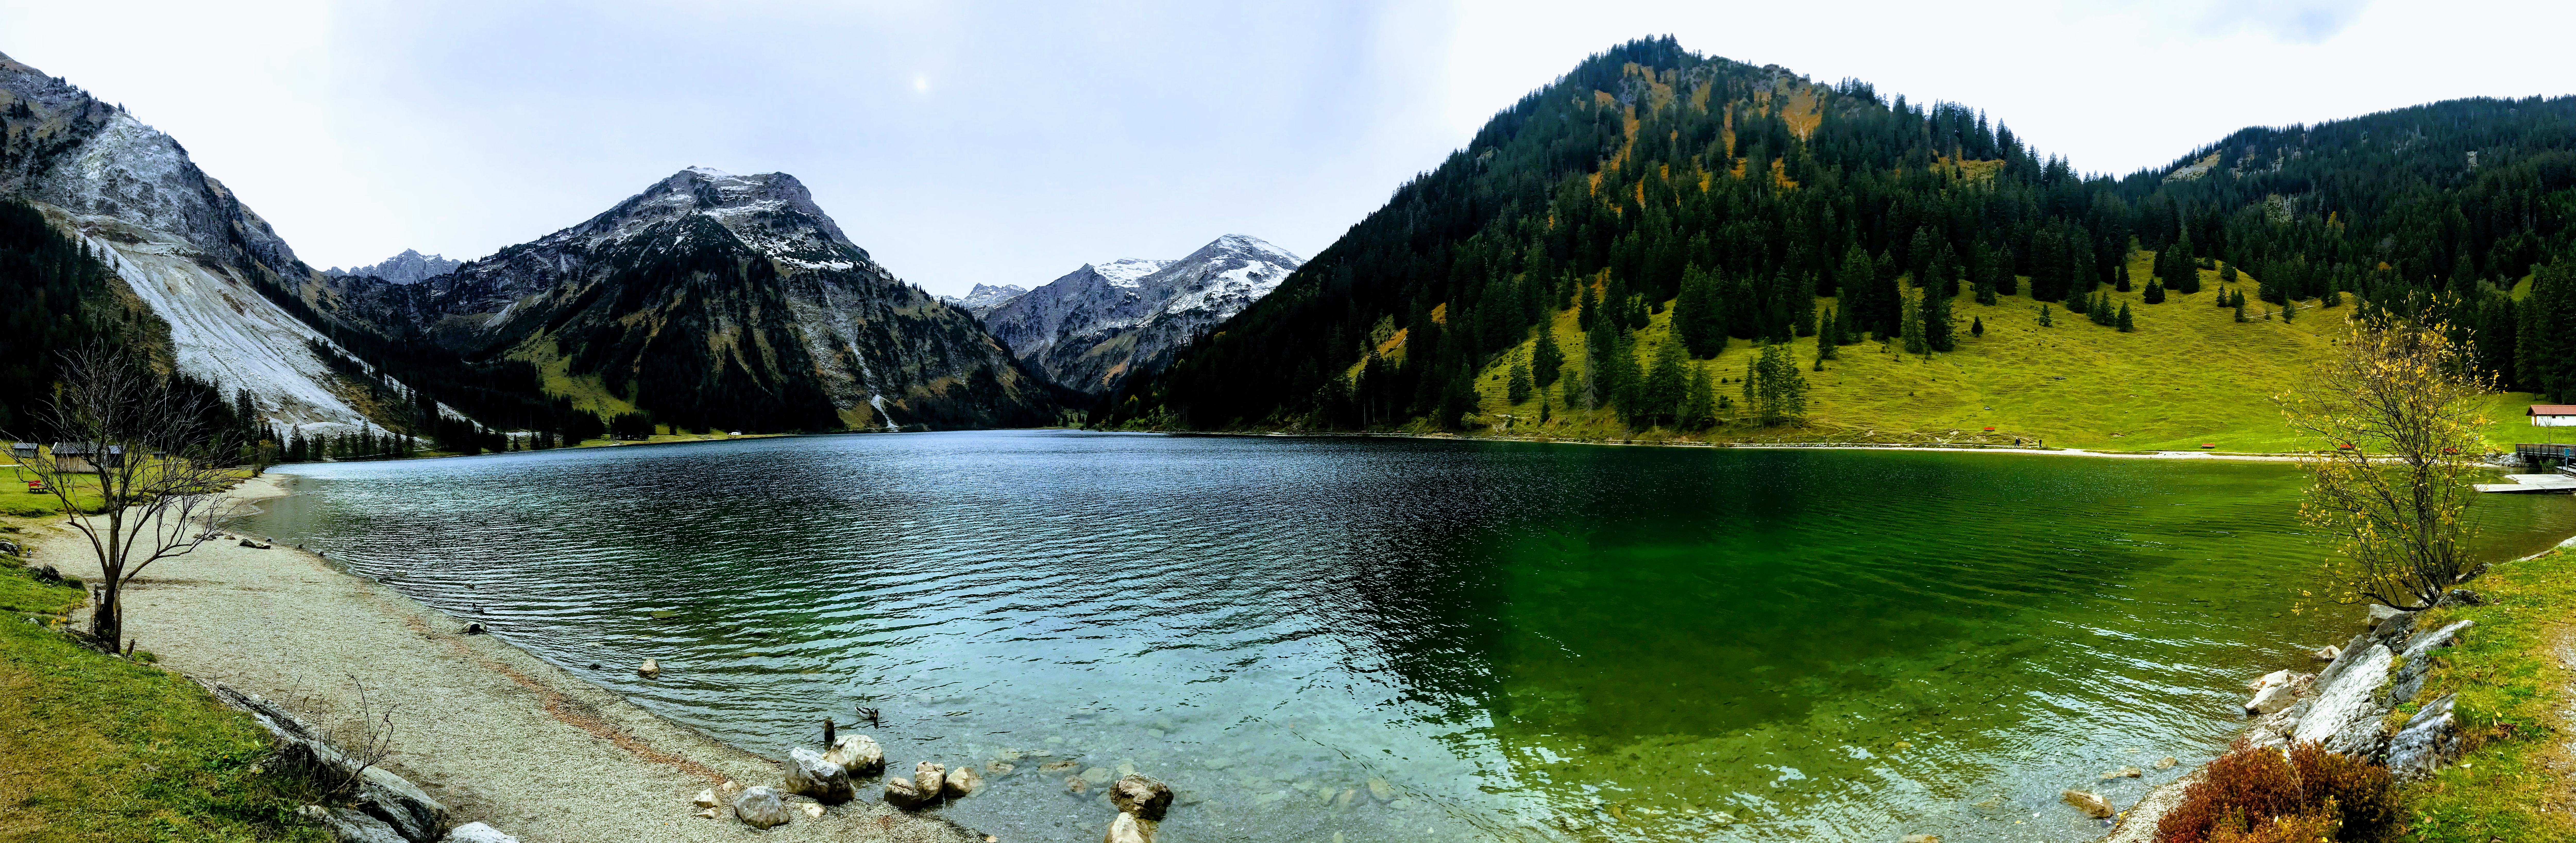 Vilsalpsee Tanneheimer Tal Tirol Oostenrijk